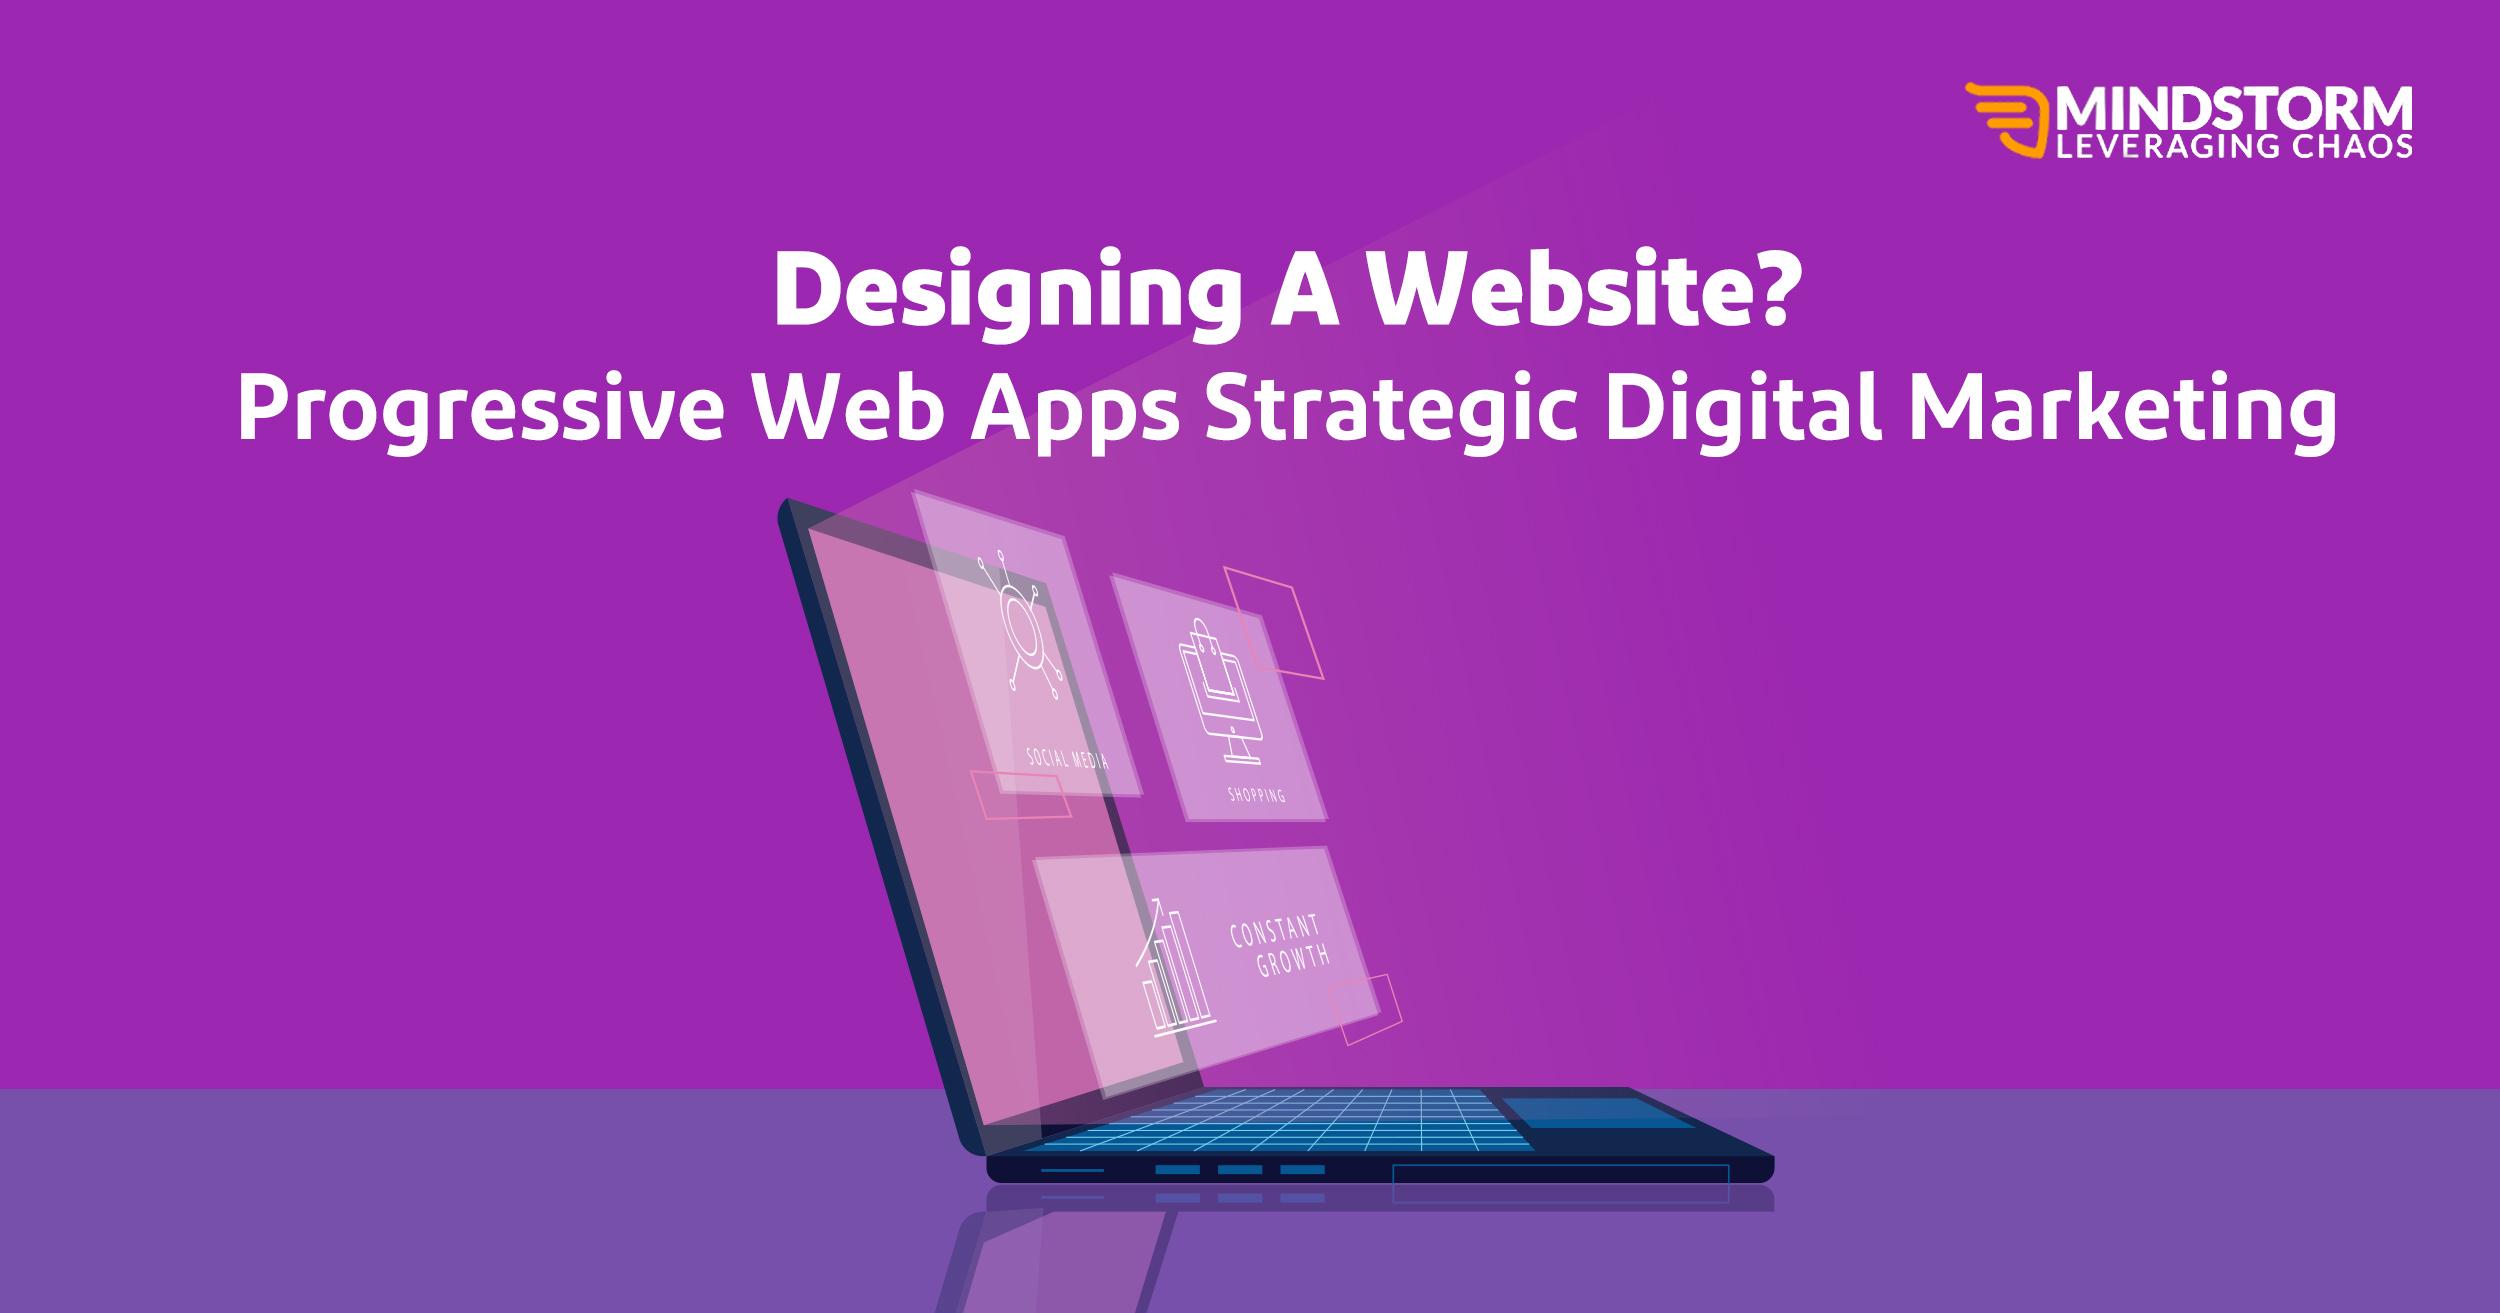 DESIGNING A WEBSITE? PROGRESSIVE WEB APPS STRATEGIC DIGITAL MARKETING